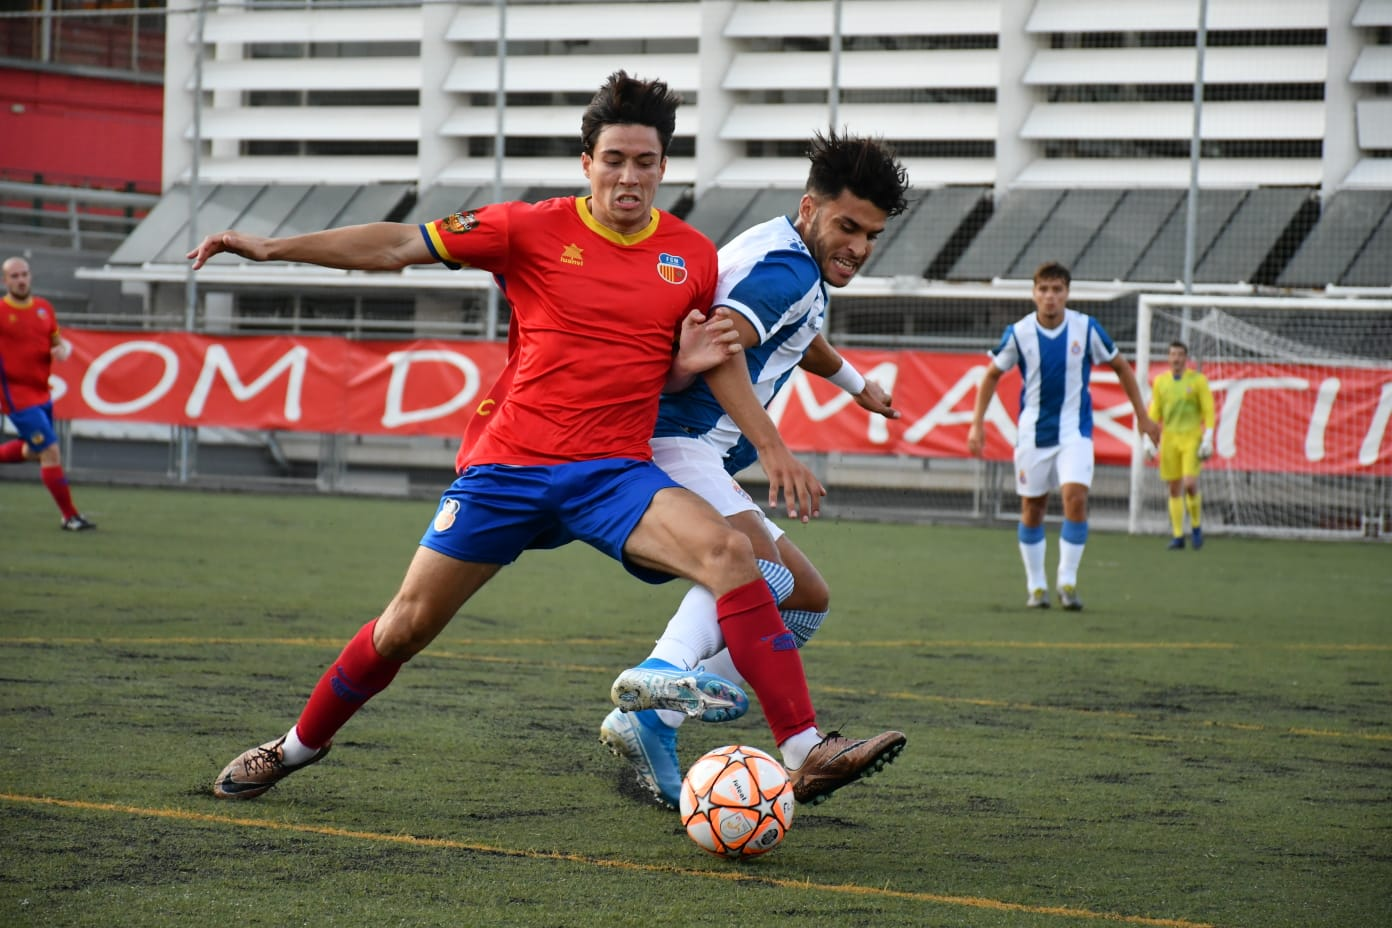 FC Martinenc - RCD Espanyol 'B' / FOTO: Dani Falcón